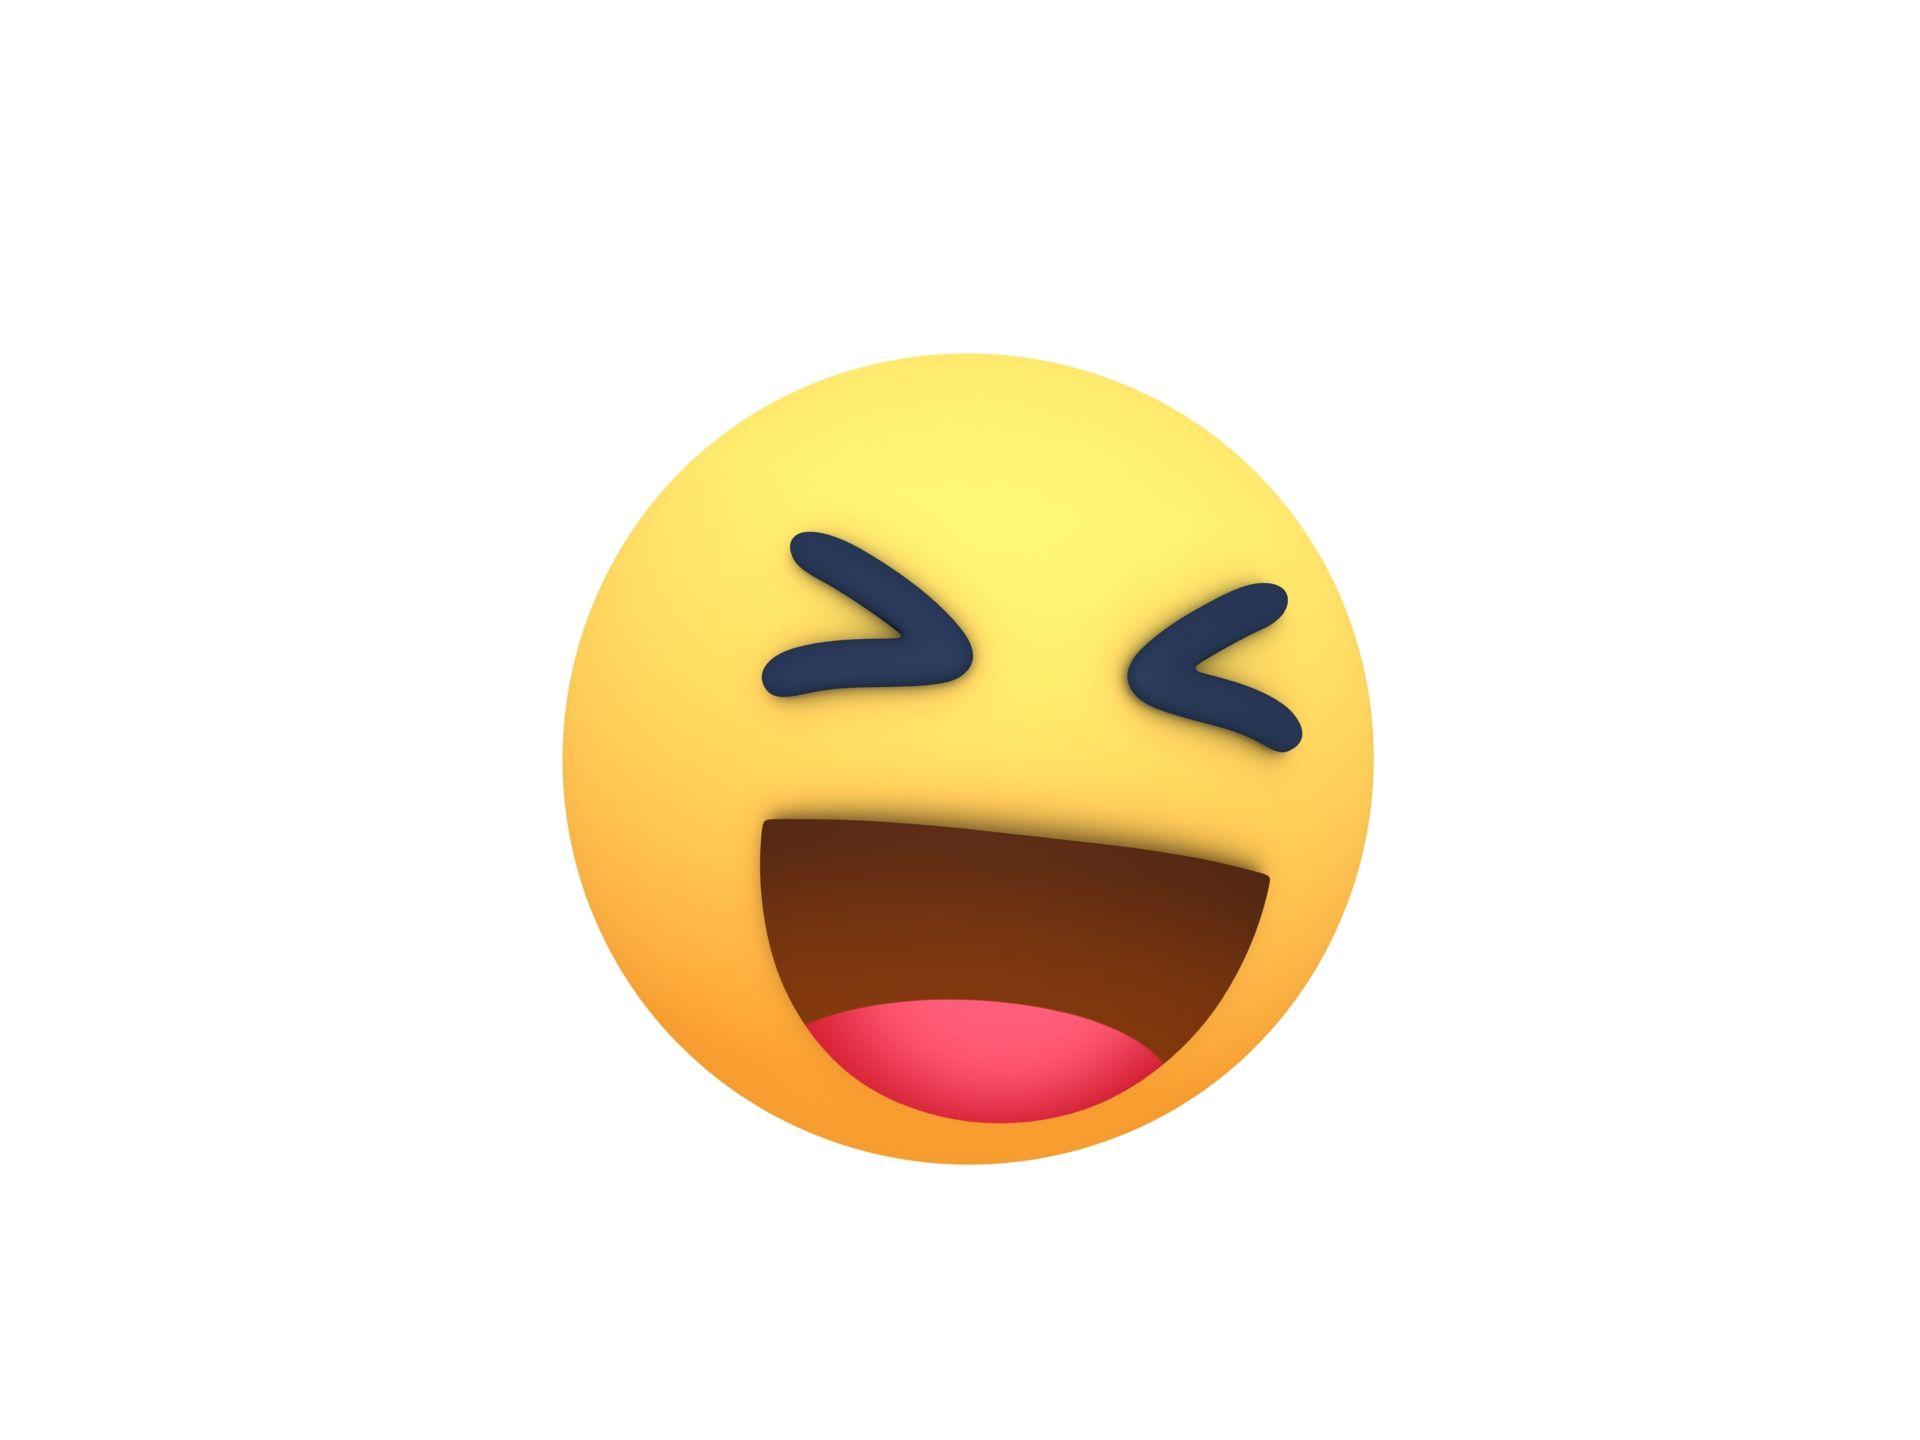 Animated Facebook Haha Reaction Button In 2020 Animation Cartoon Styles Haha